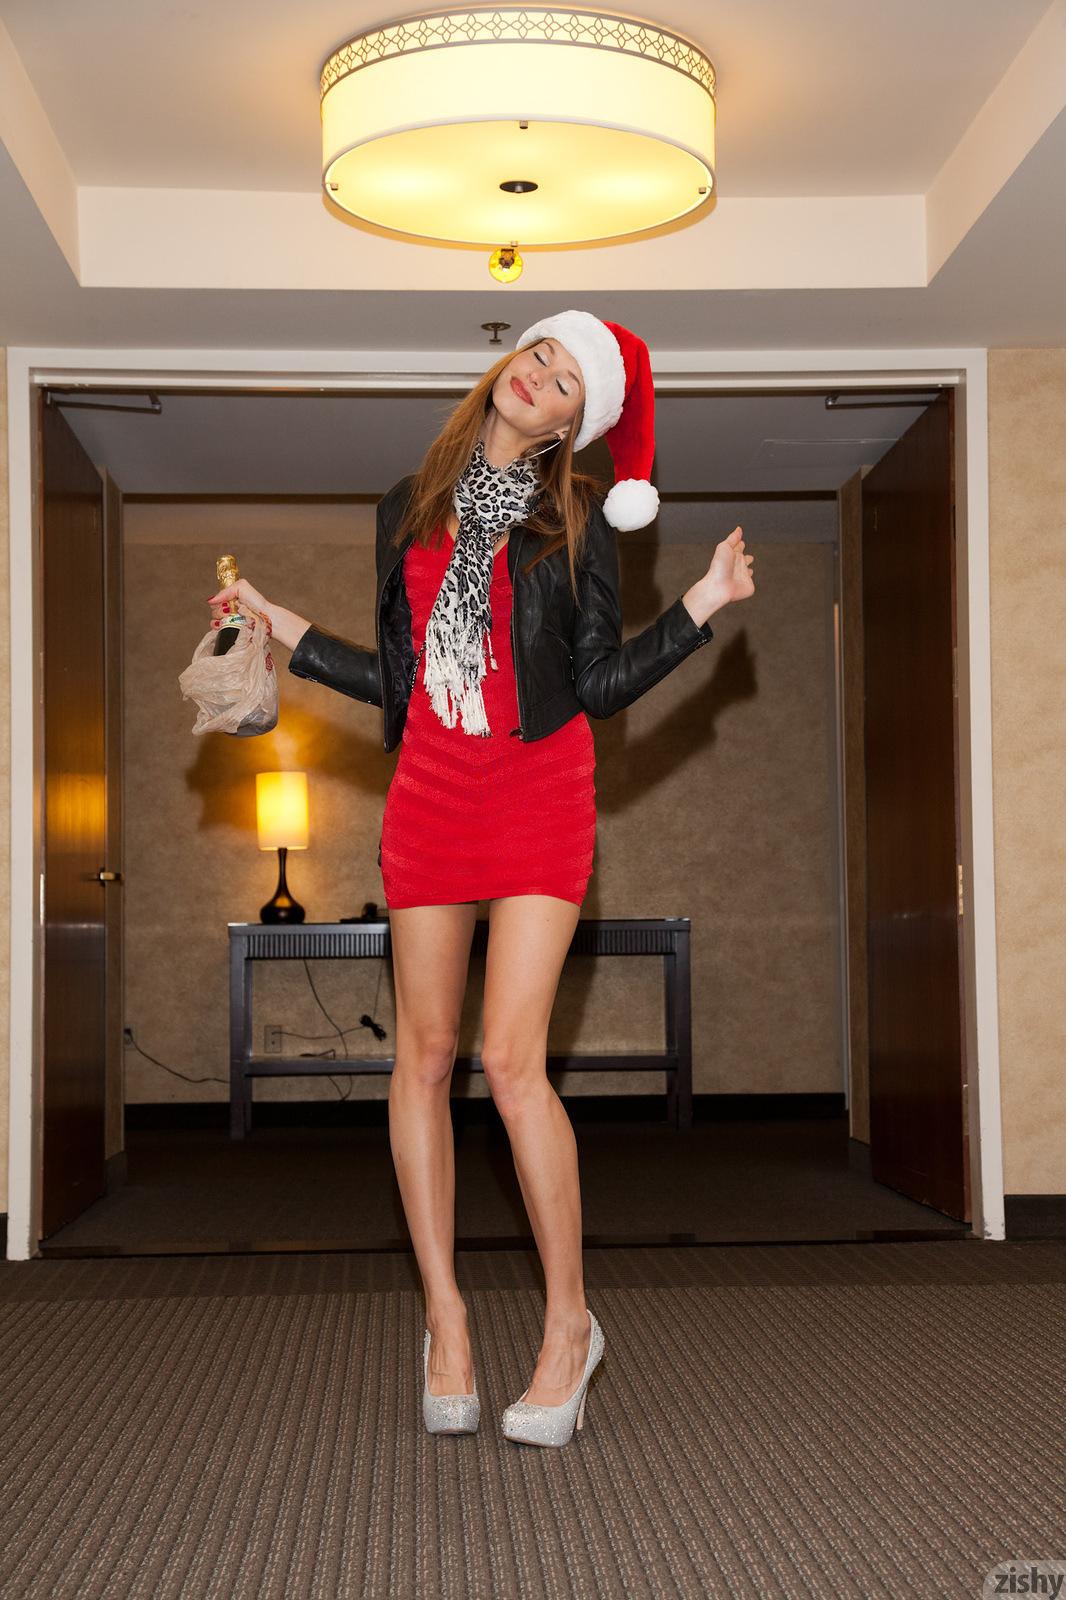 Geri Burgess Holiday Party Red Dress Zishy 02 Redbust